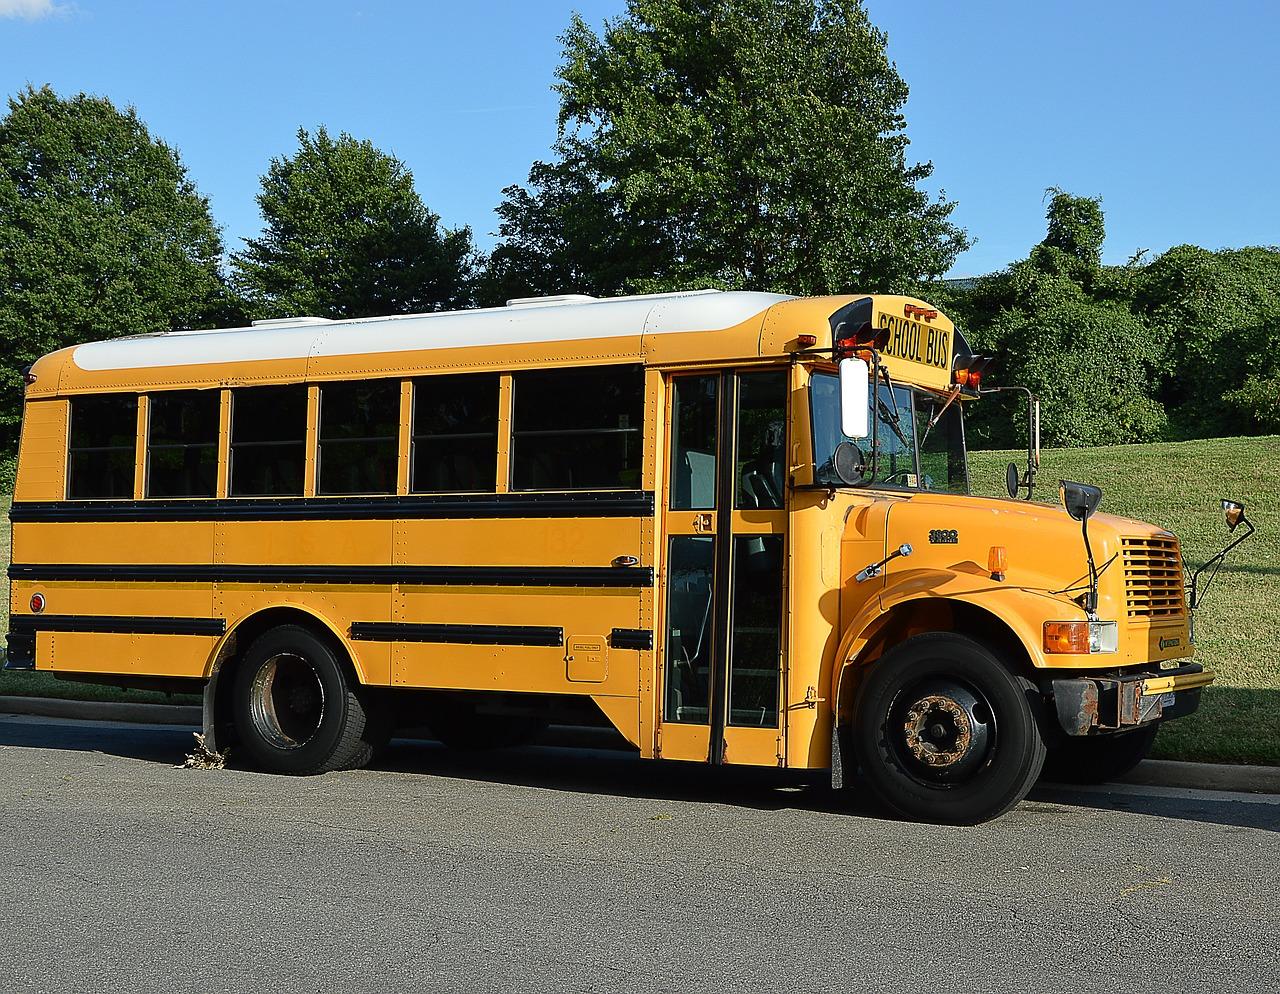 school-bus-2122395_1280